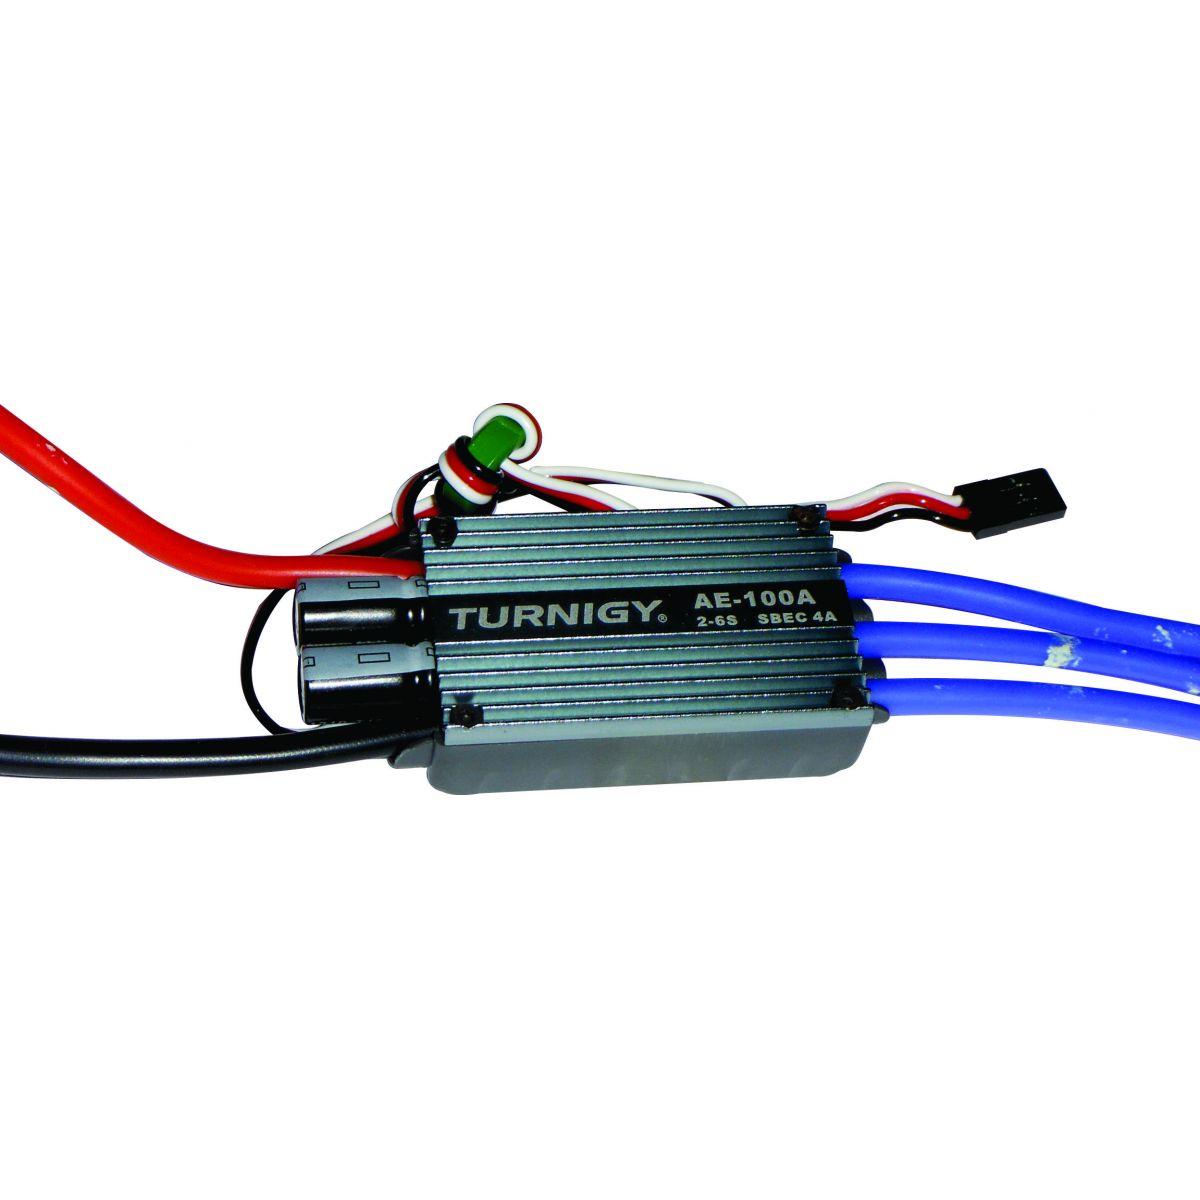 Speed Control Turnigy Ae 100a Com Super Bec 4a Integrado  - King Models